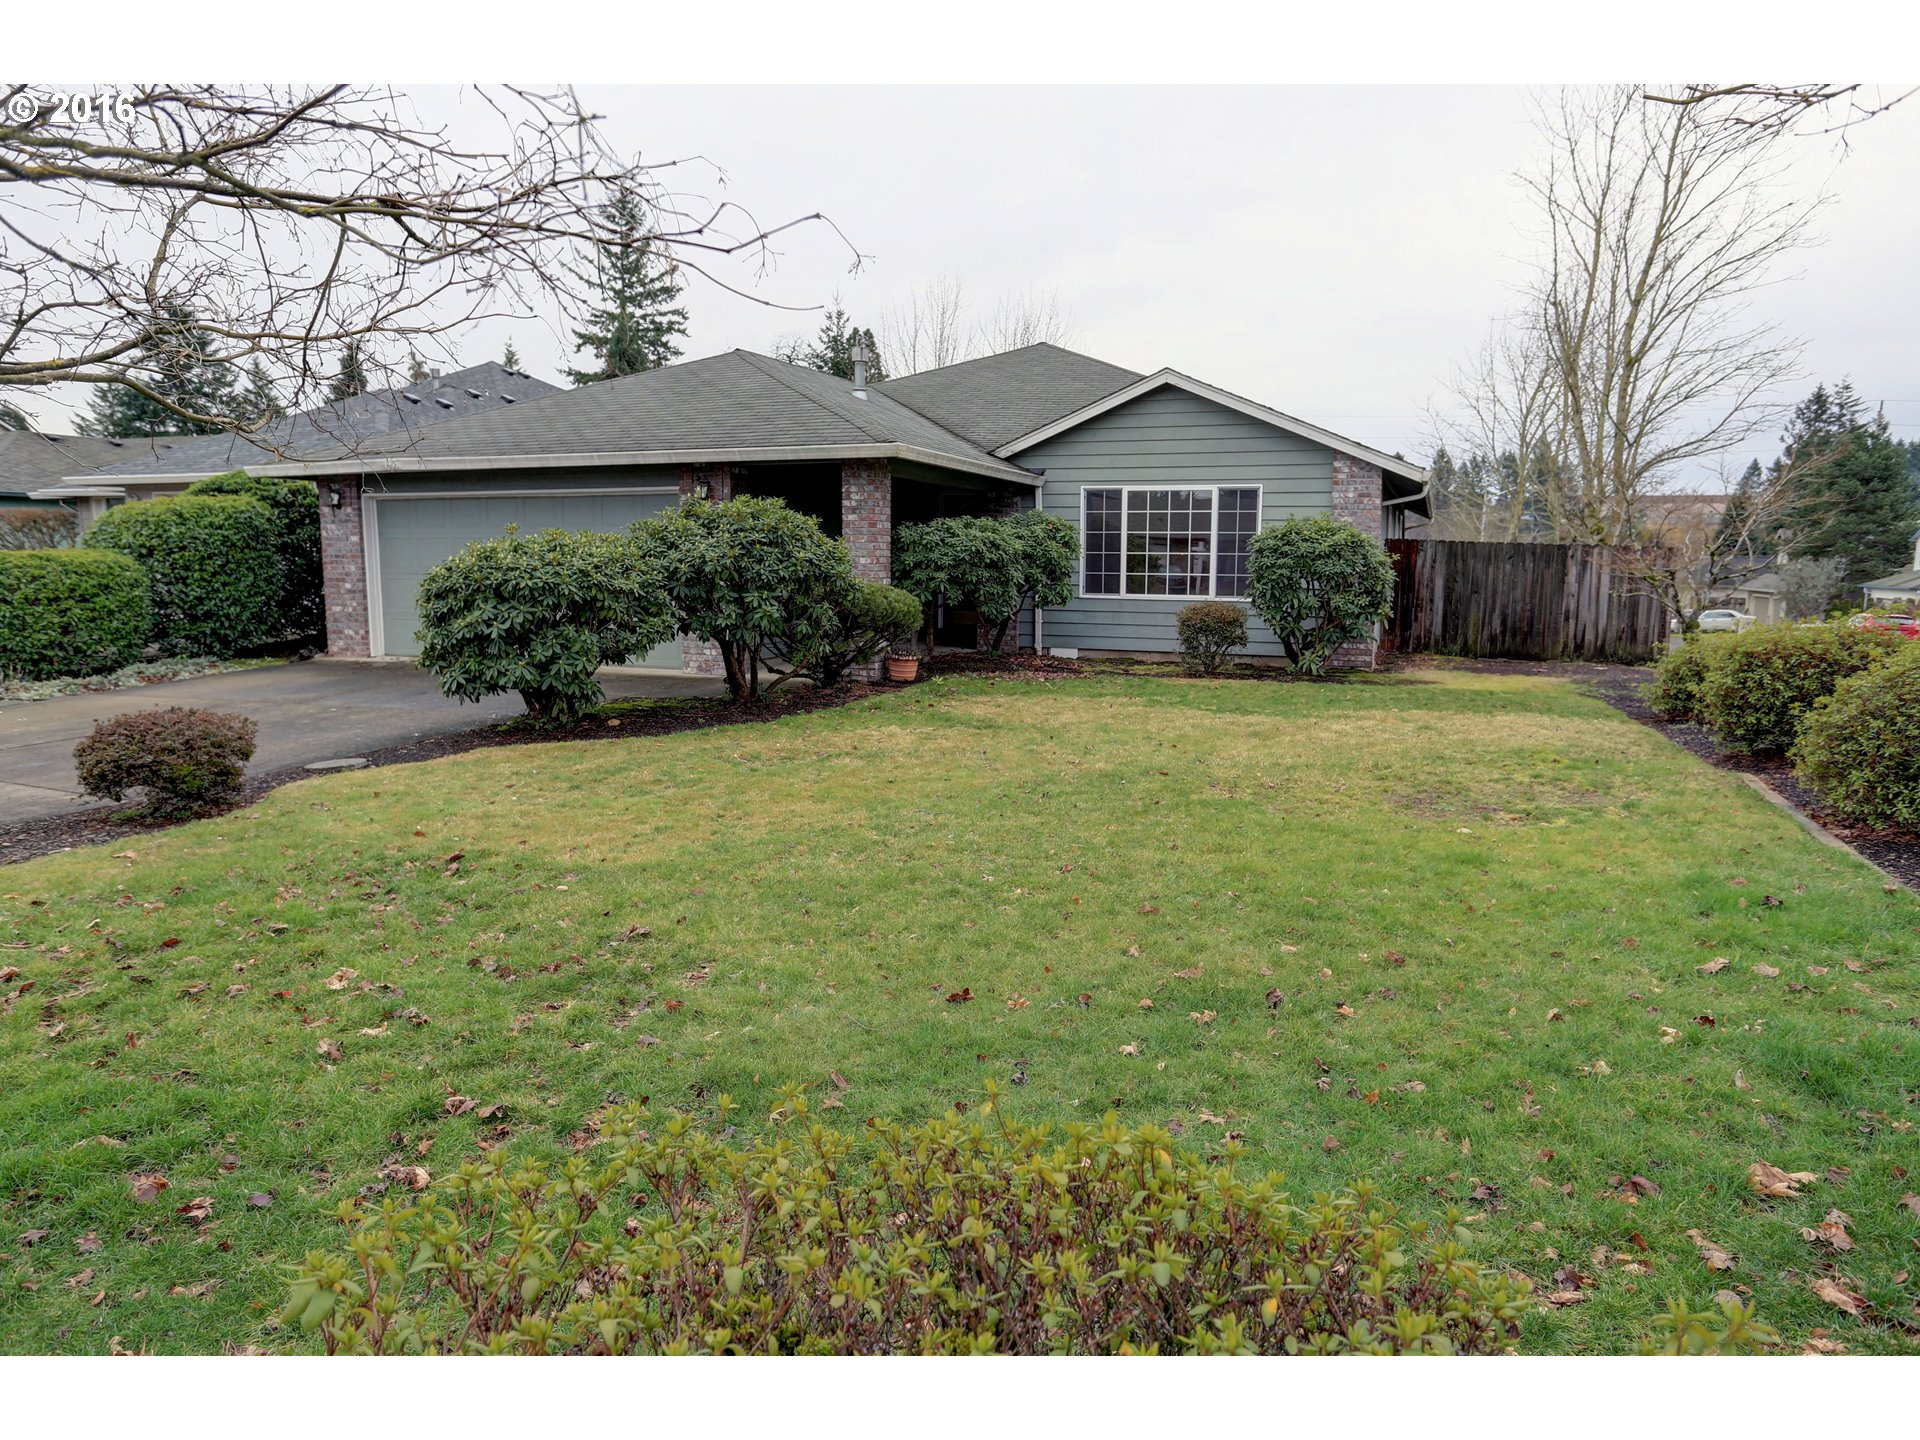 14501 NE 31ST ST, Vancouver, WA 98682